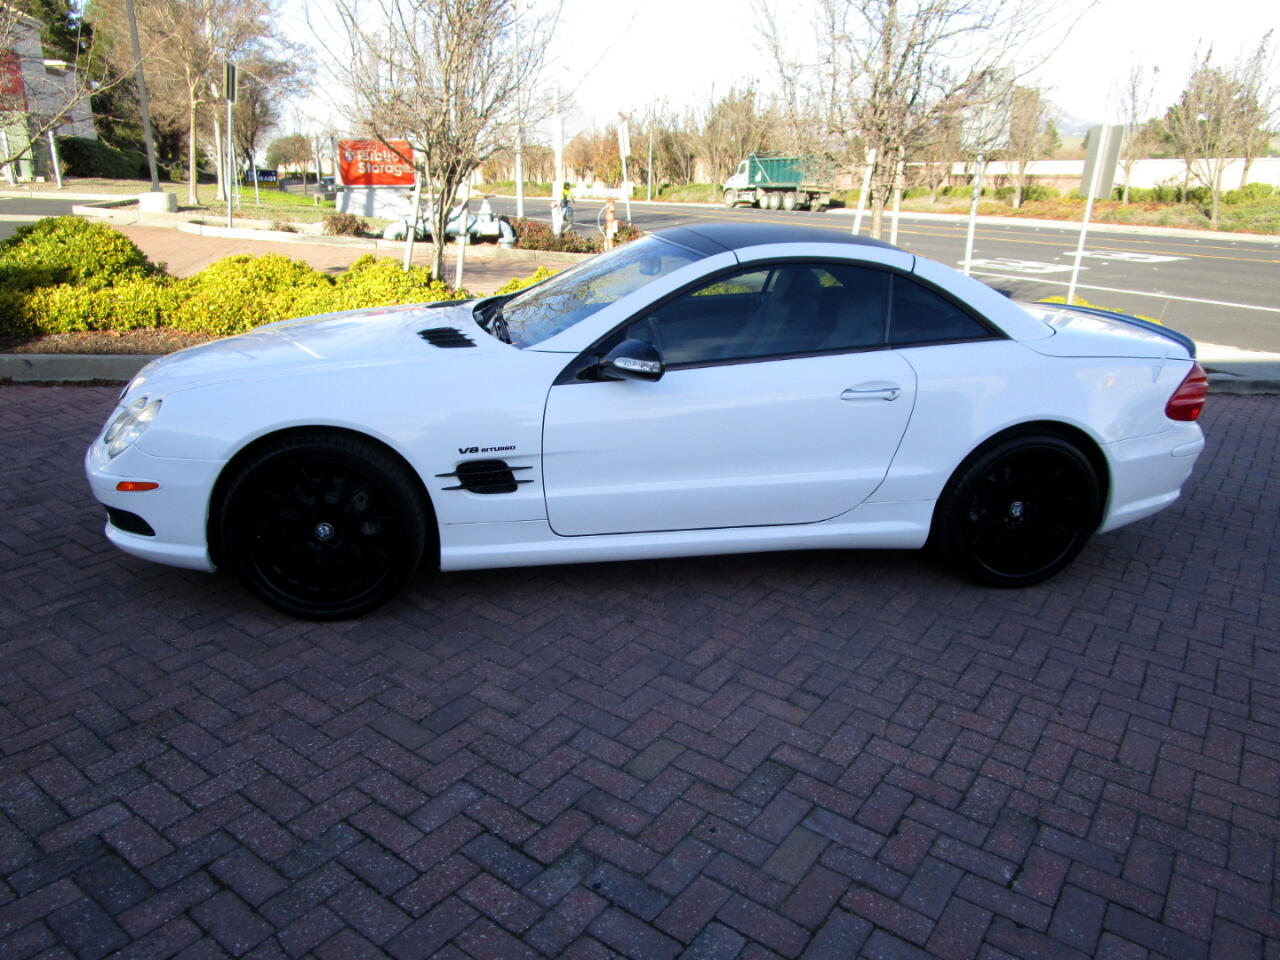 2003 Mercedes-Benz SL-Class SL500 W/$15K IN SL55 AMG TRIM*WHITE WRAP BY A PRO*